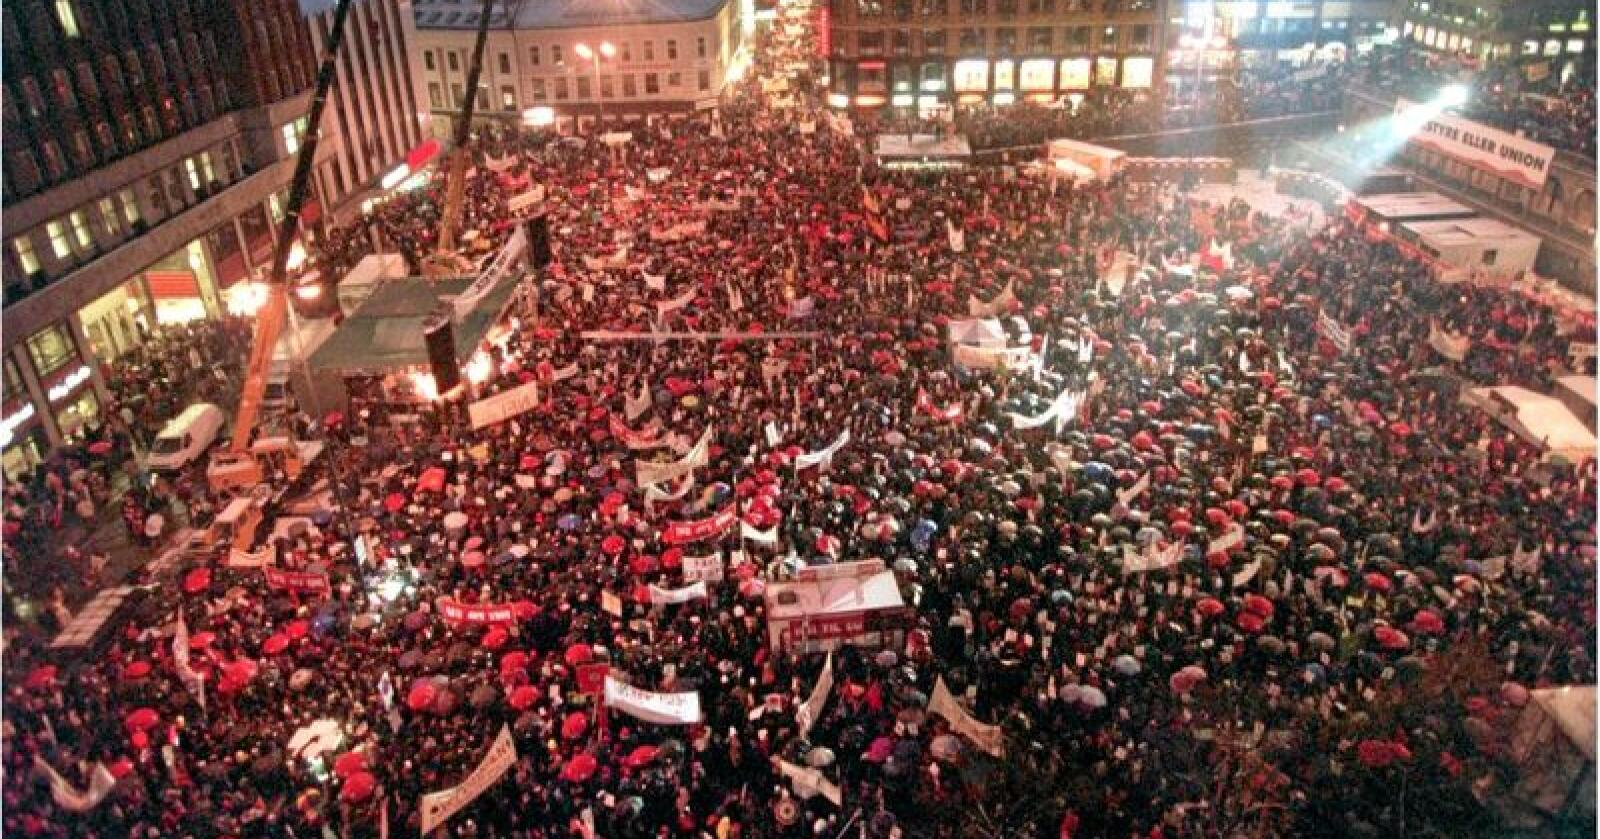 25 år: 21. november 1994 demonstrerte over 25.000 mot norsk medlemsskap i EU. Foto: Johnny Syversen / NTB scanpix